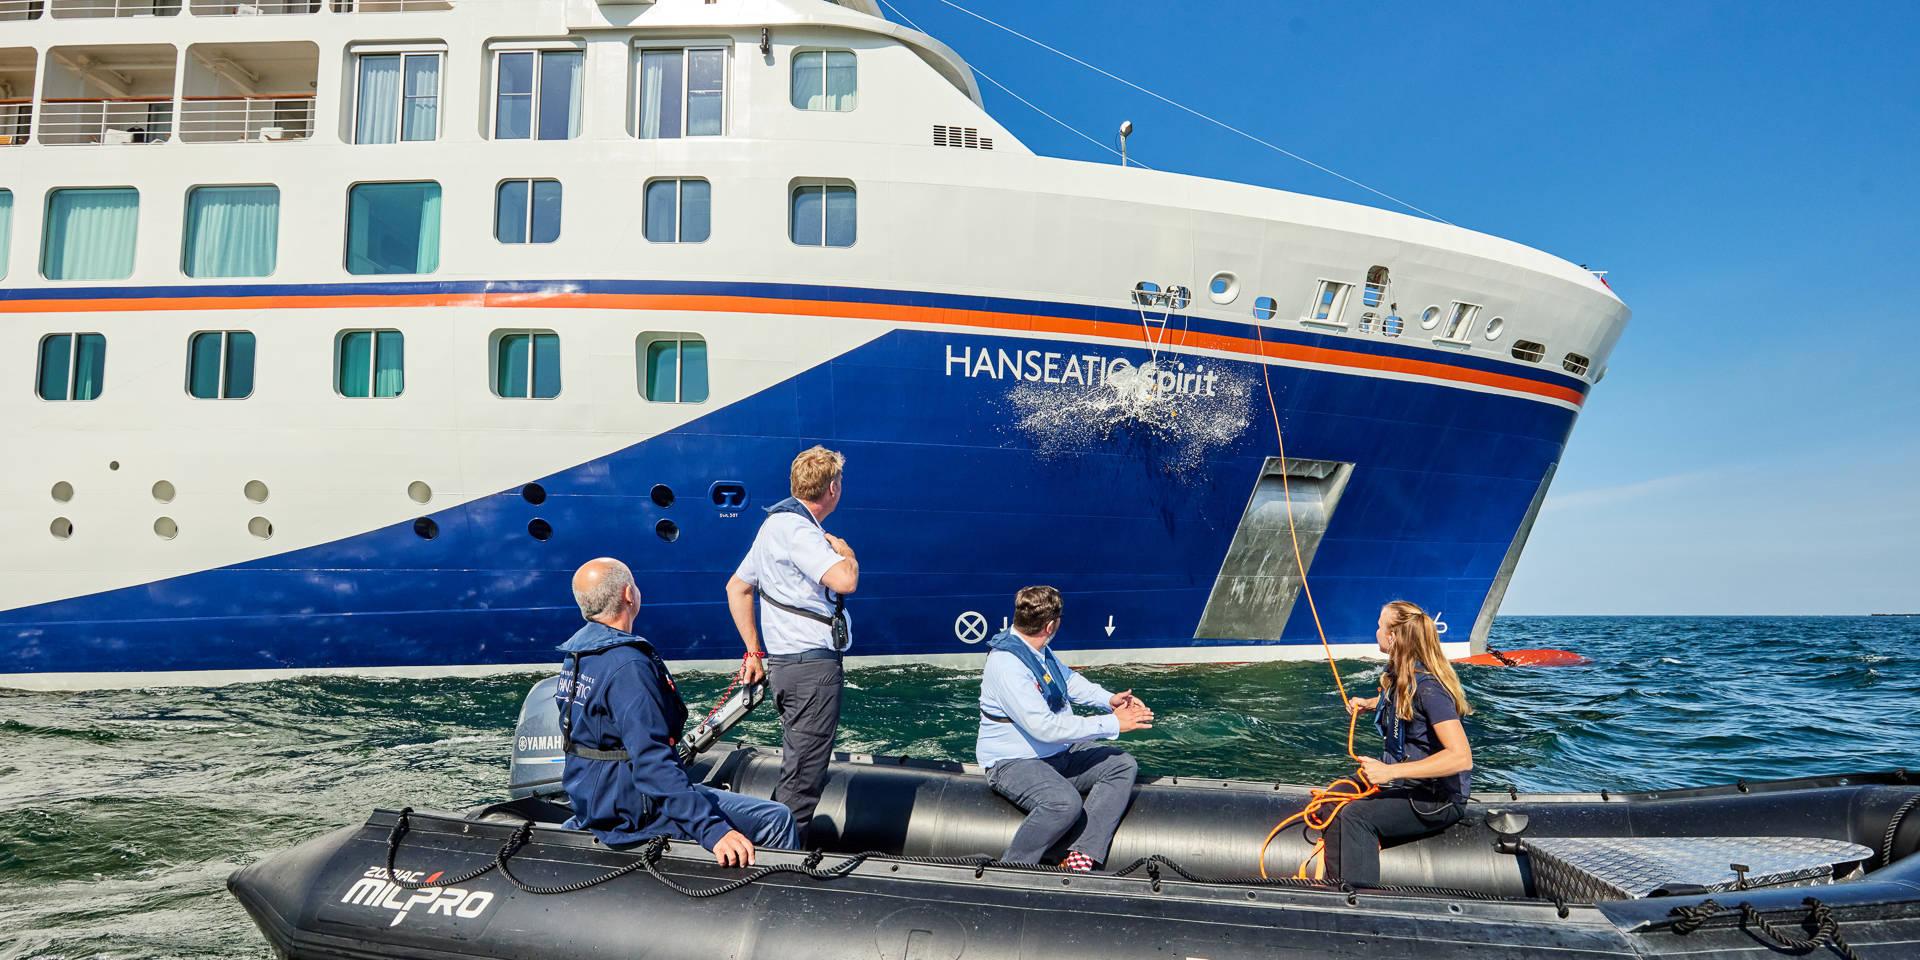 Hapag Lloyd Cruises HANSEATIC Spirit